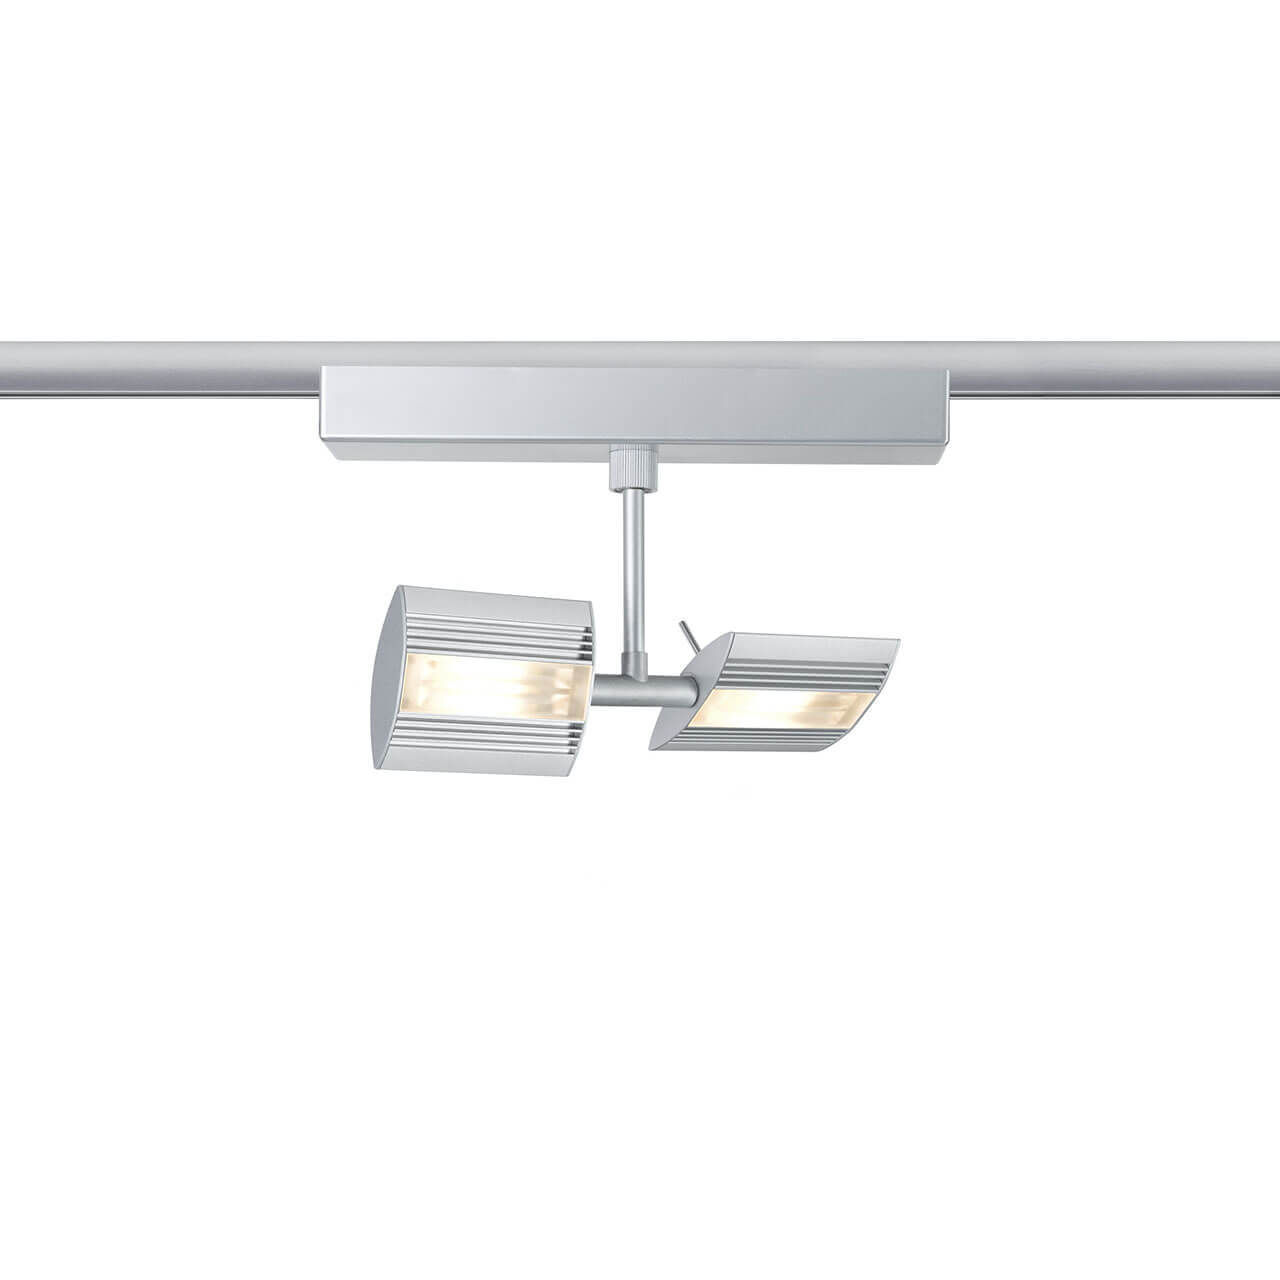 Светильник Paulmann 95038 Linear